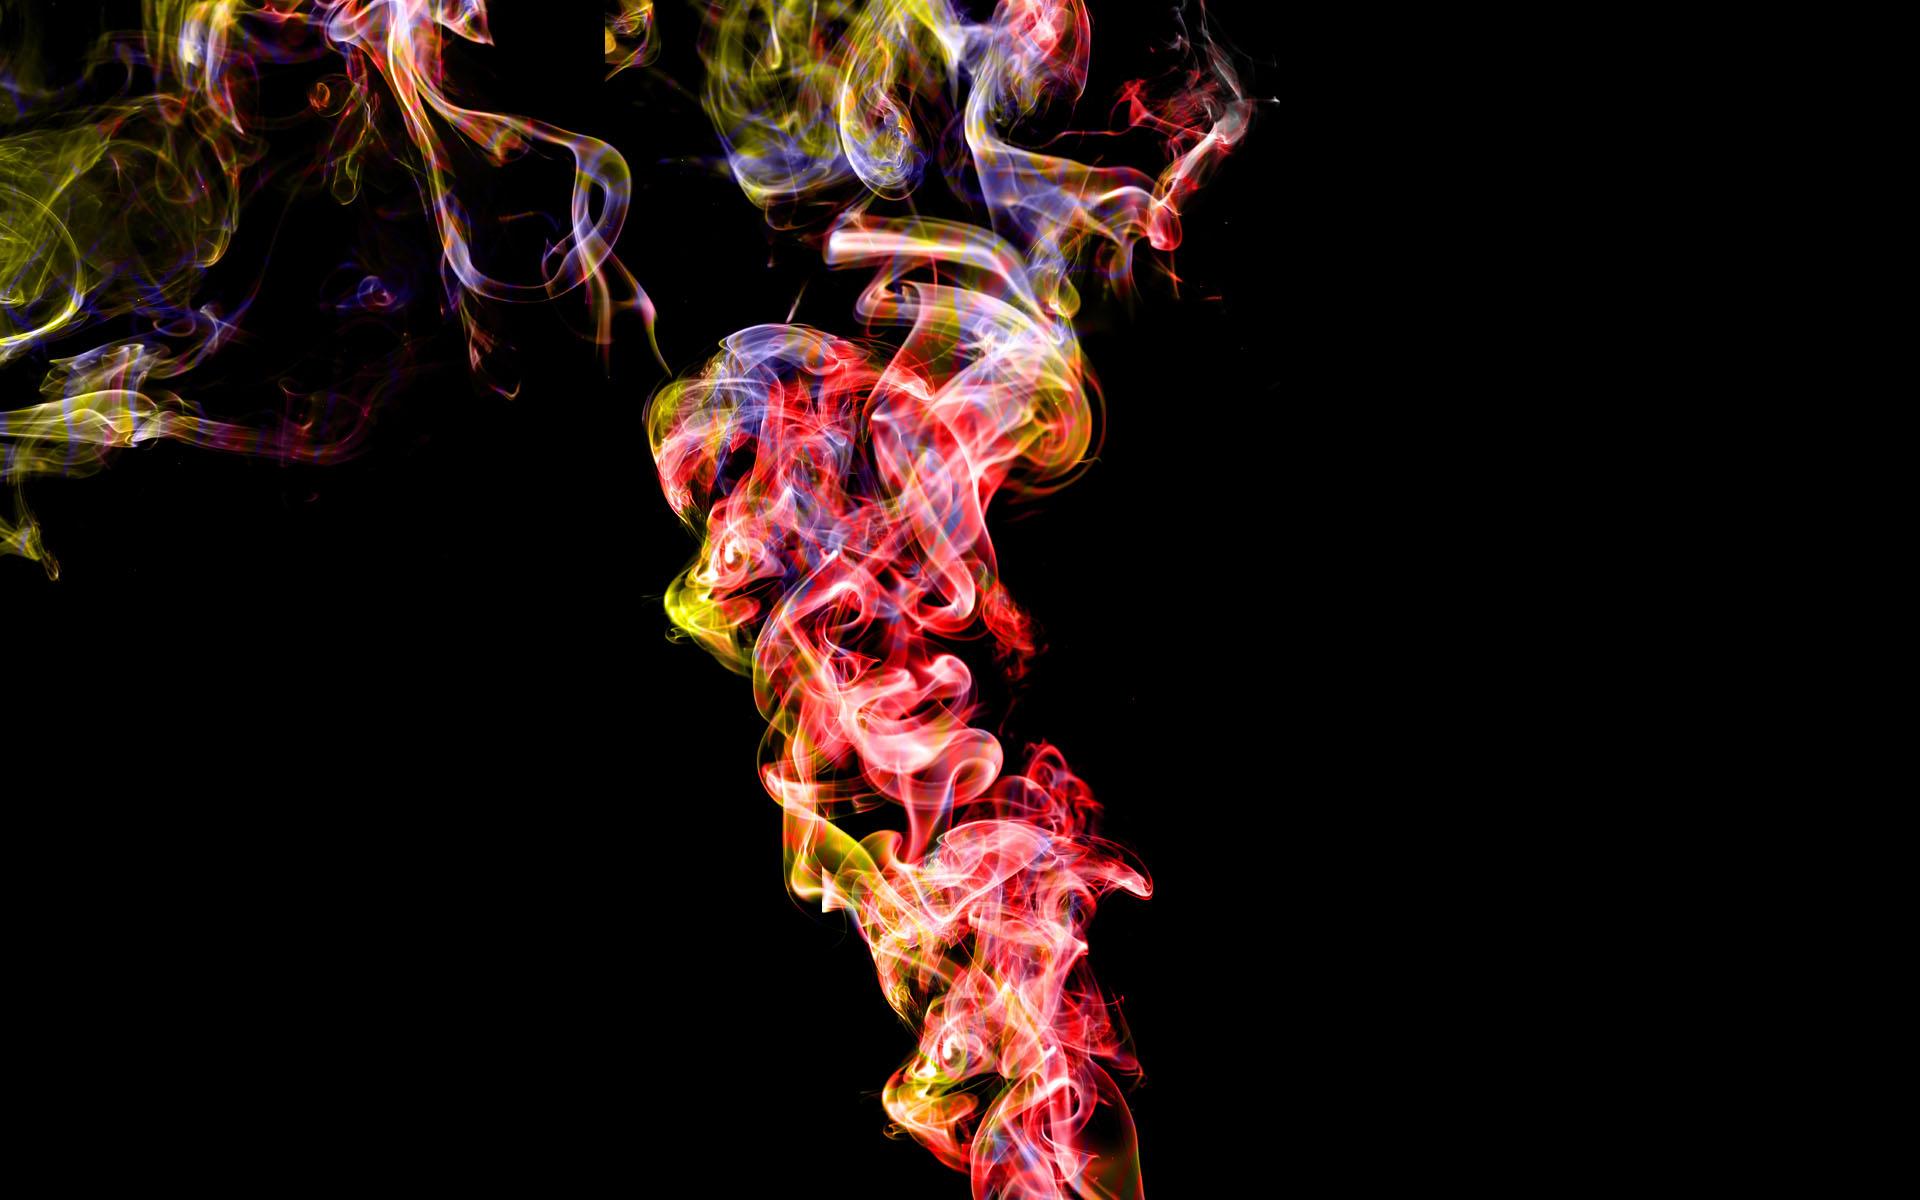 colored smoke wallpaperkaleidoscopeeyez on deviantart